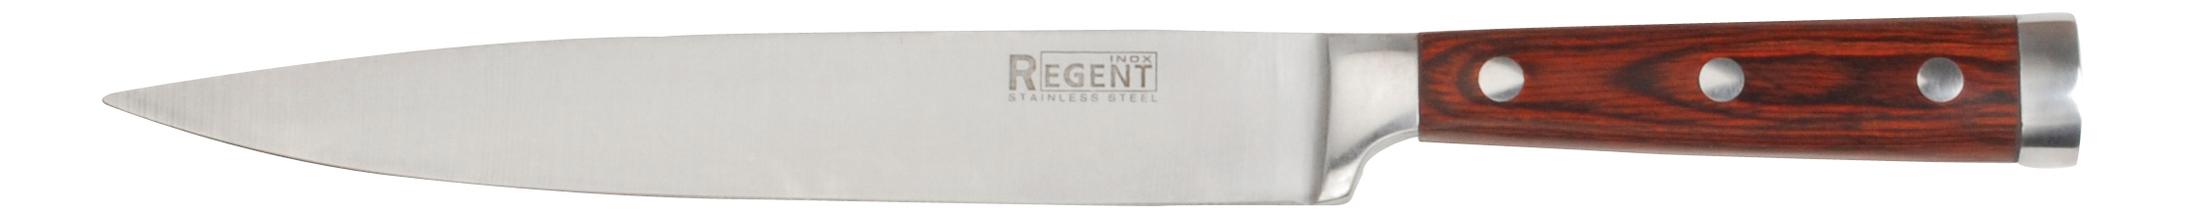 Нож кухонный REGENT inox 93 KN